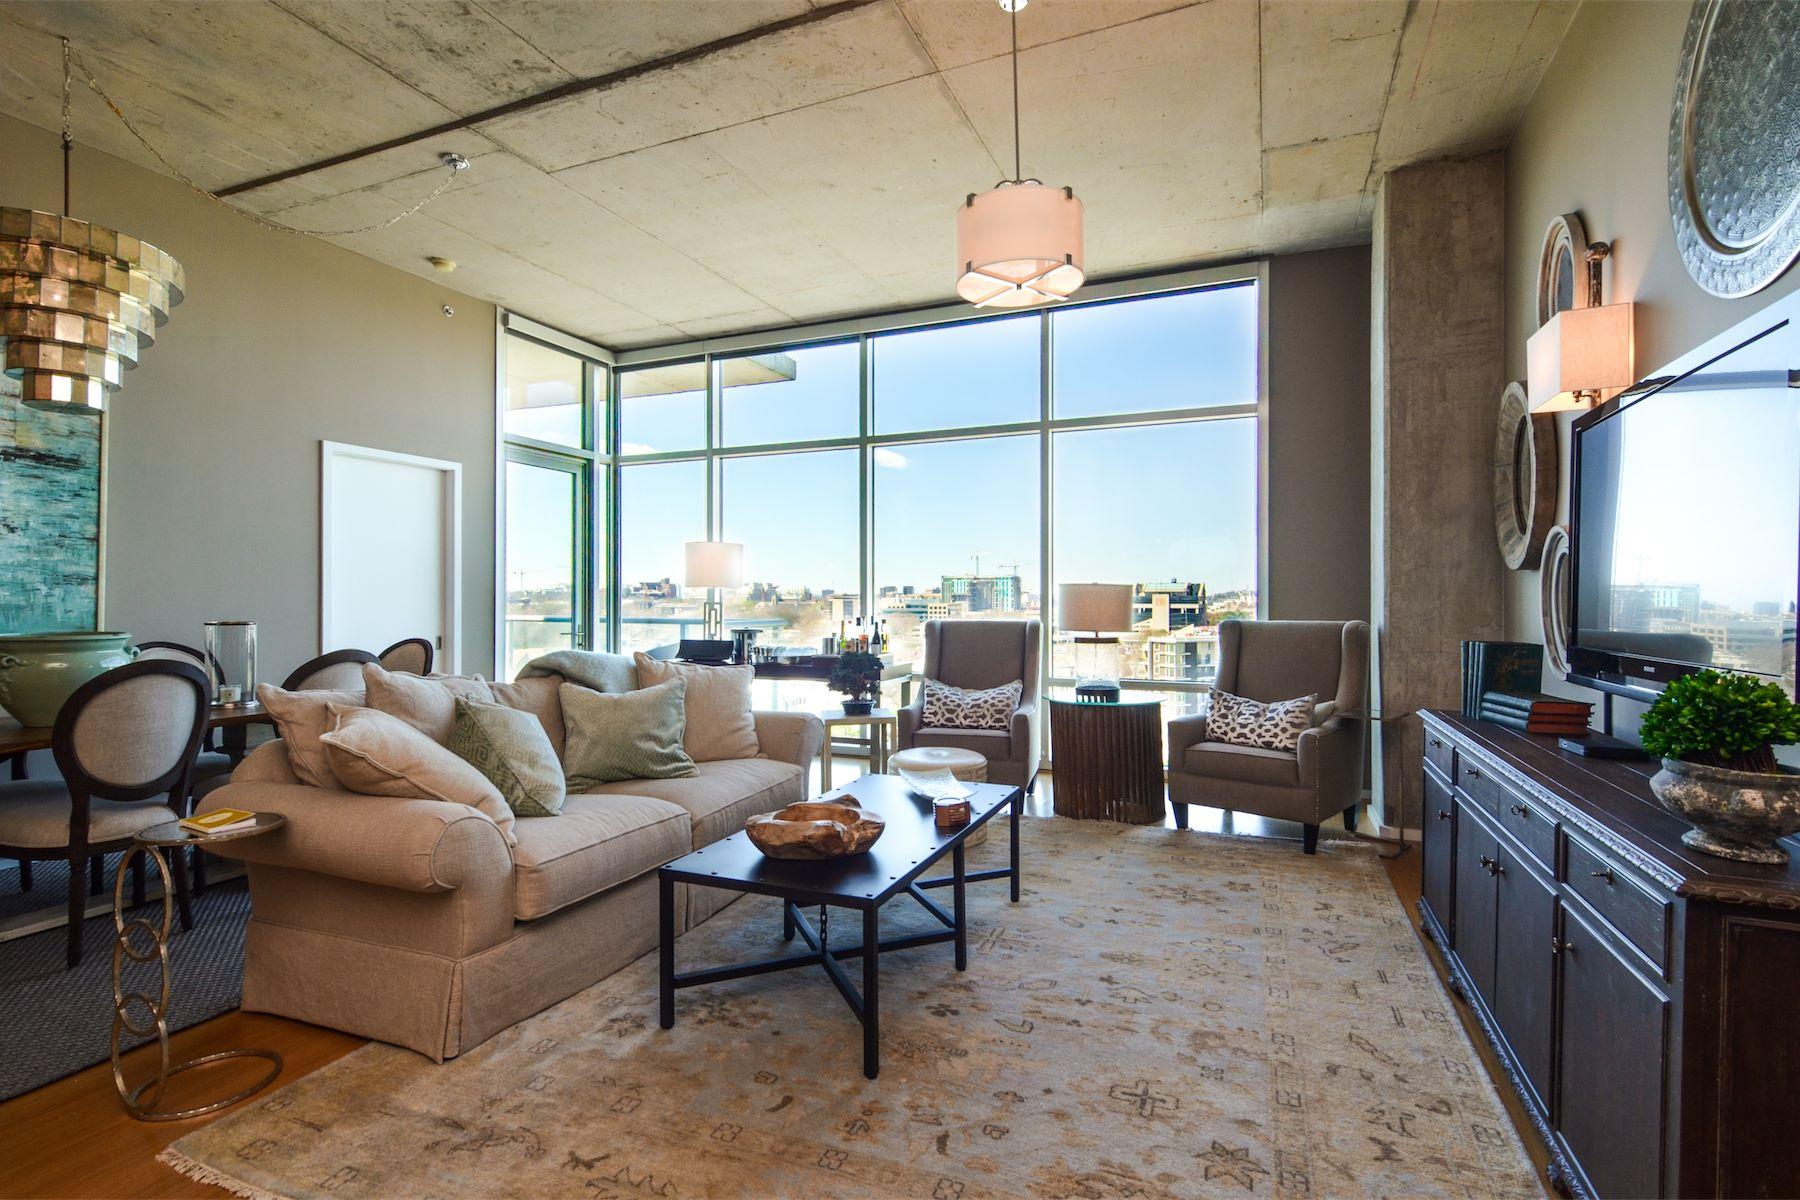 Condominium for Sale at Ravishing Terrazzo Condo in Midtown 700 12th Ave S Unit 1013 Nashville, Tennessee 37203 United States